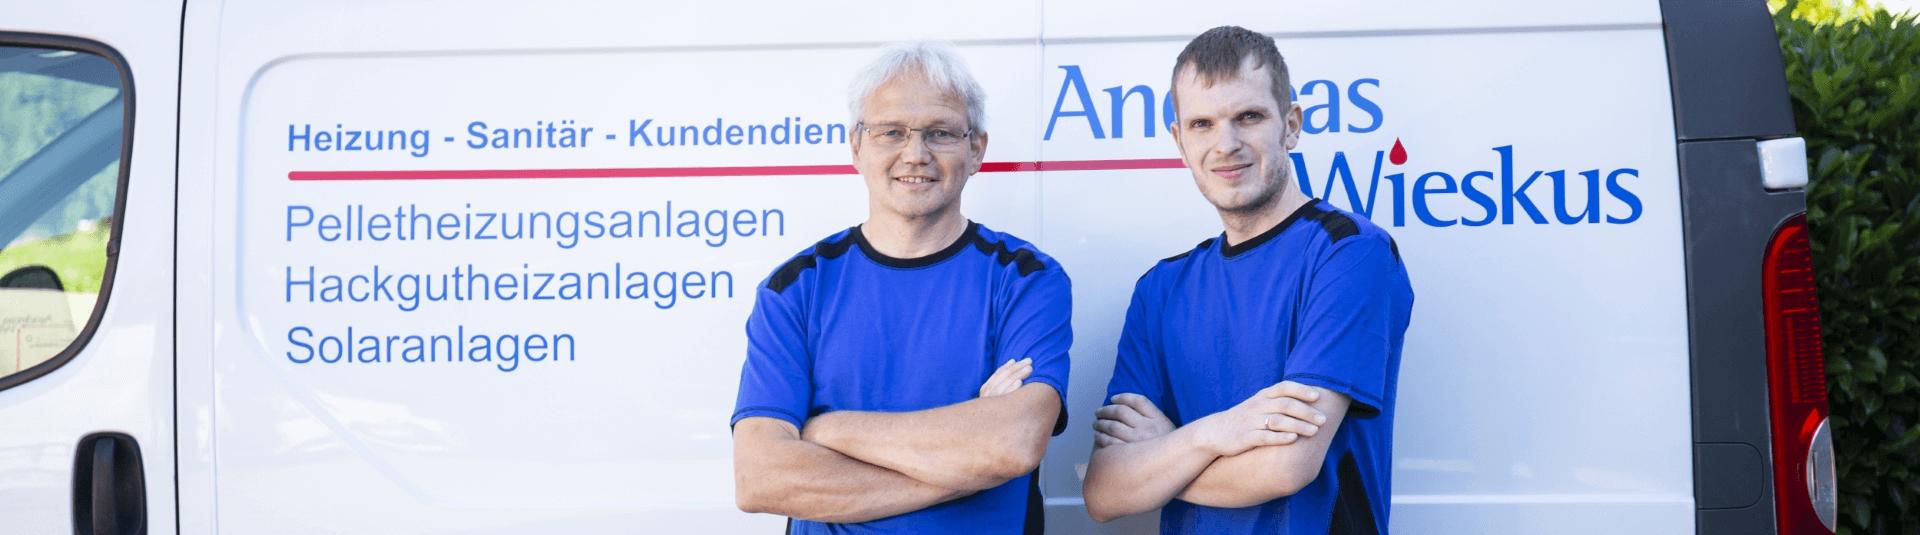 andreas-wieskus-duelmen-sanitaer-heizung-ueber-uns